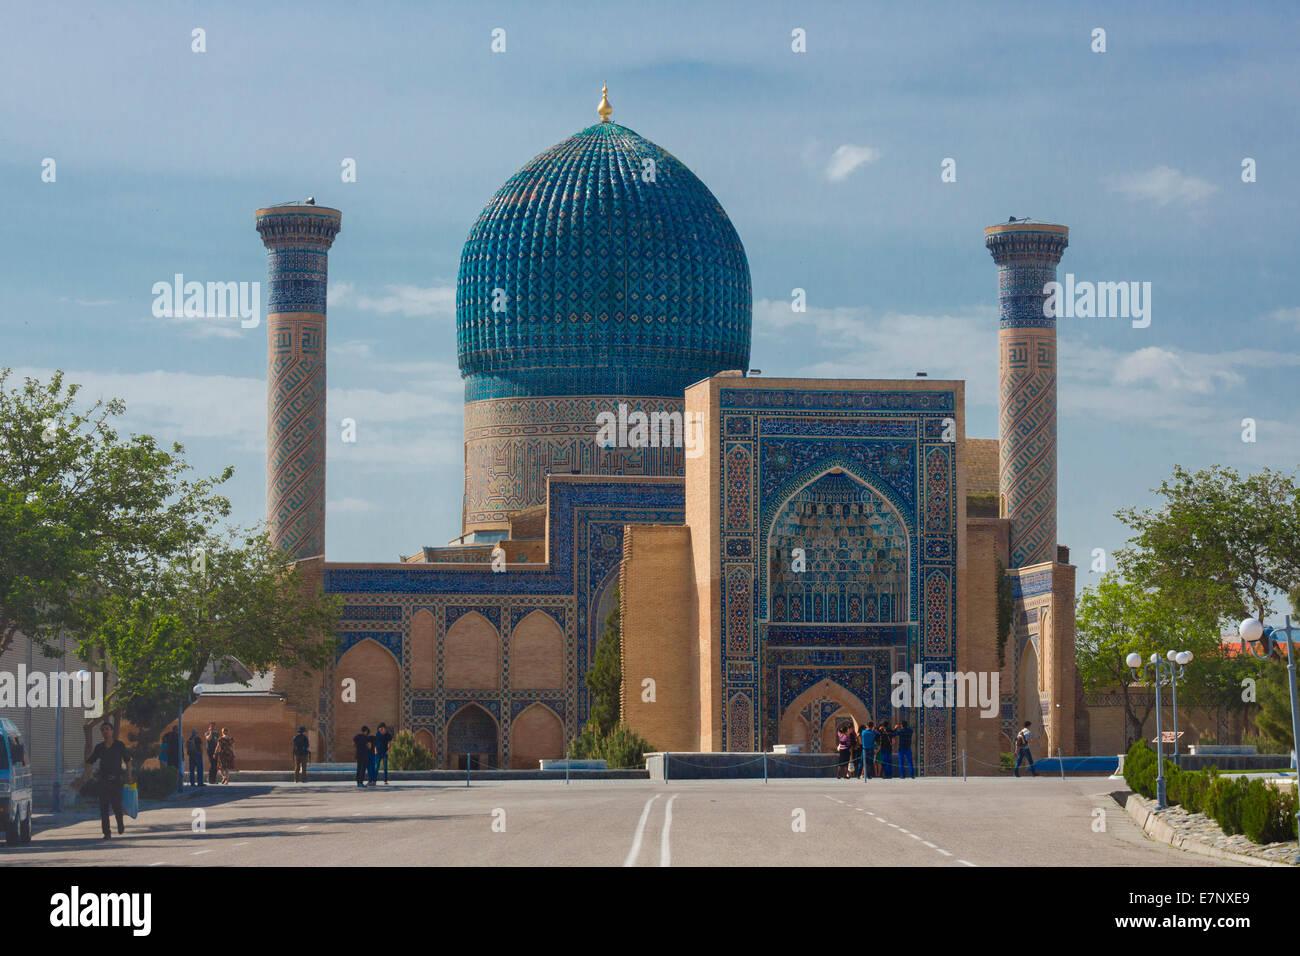 famous architecture in the world. World Heritage, Amir Timur, Mausoleum, Samarkand, City, Uzbekistan, Central Asia, Architecture, Colourful, Famous, History Famous Architecture In The R